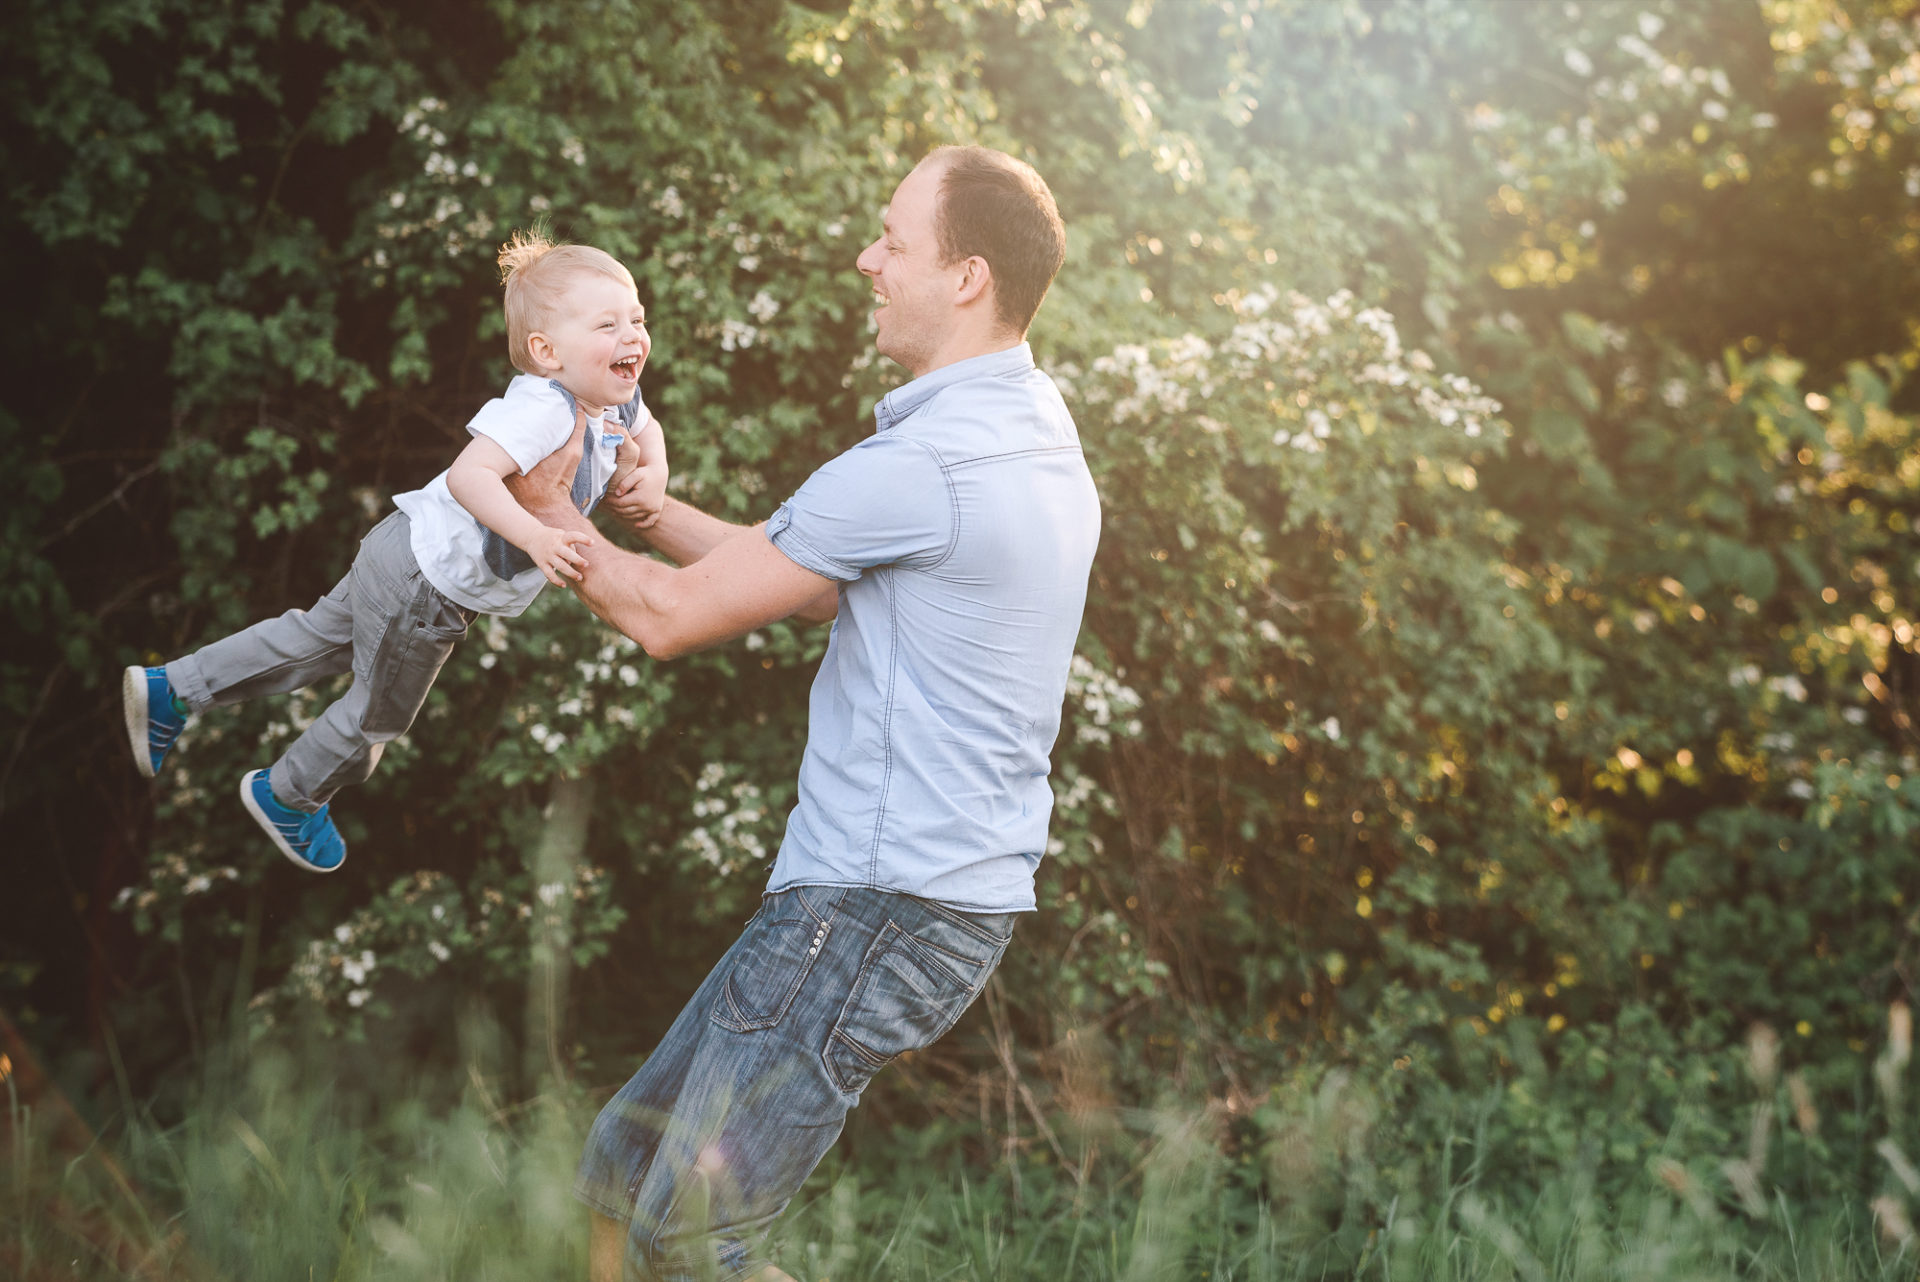 Erfurt Thüringen Tessa Trommer Fotografie Baby Geschwister Familienfotos Outdoor Papa